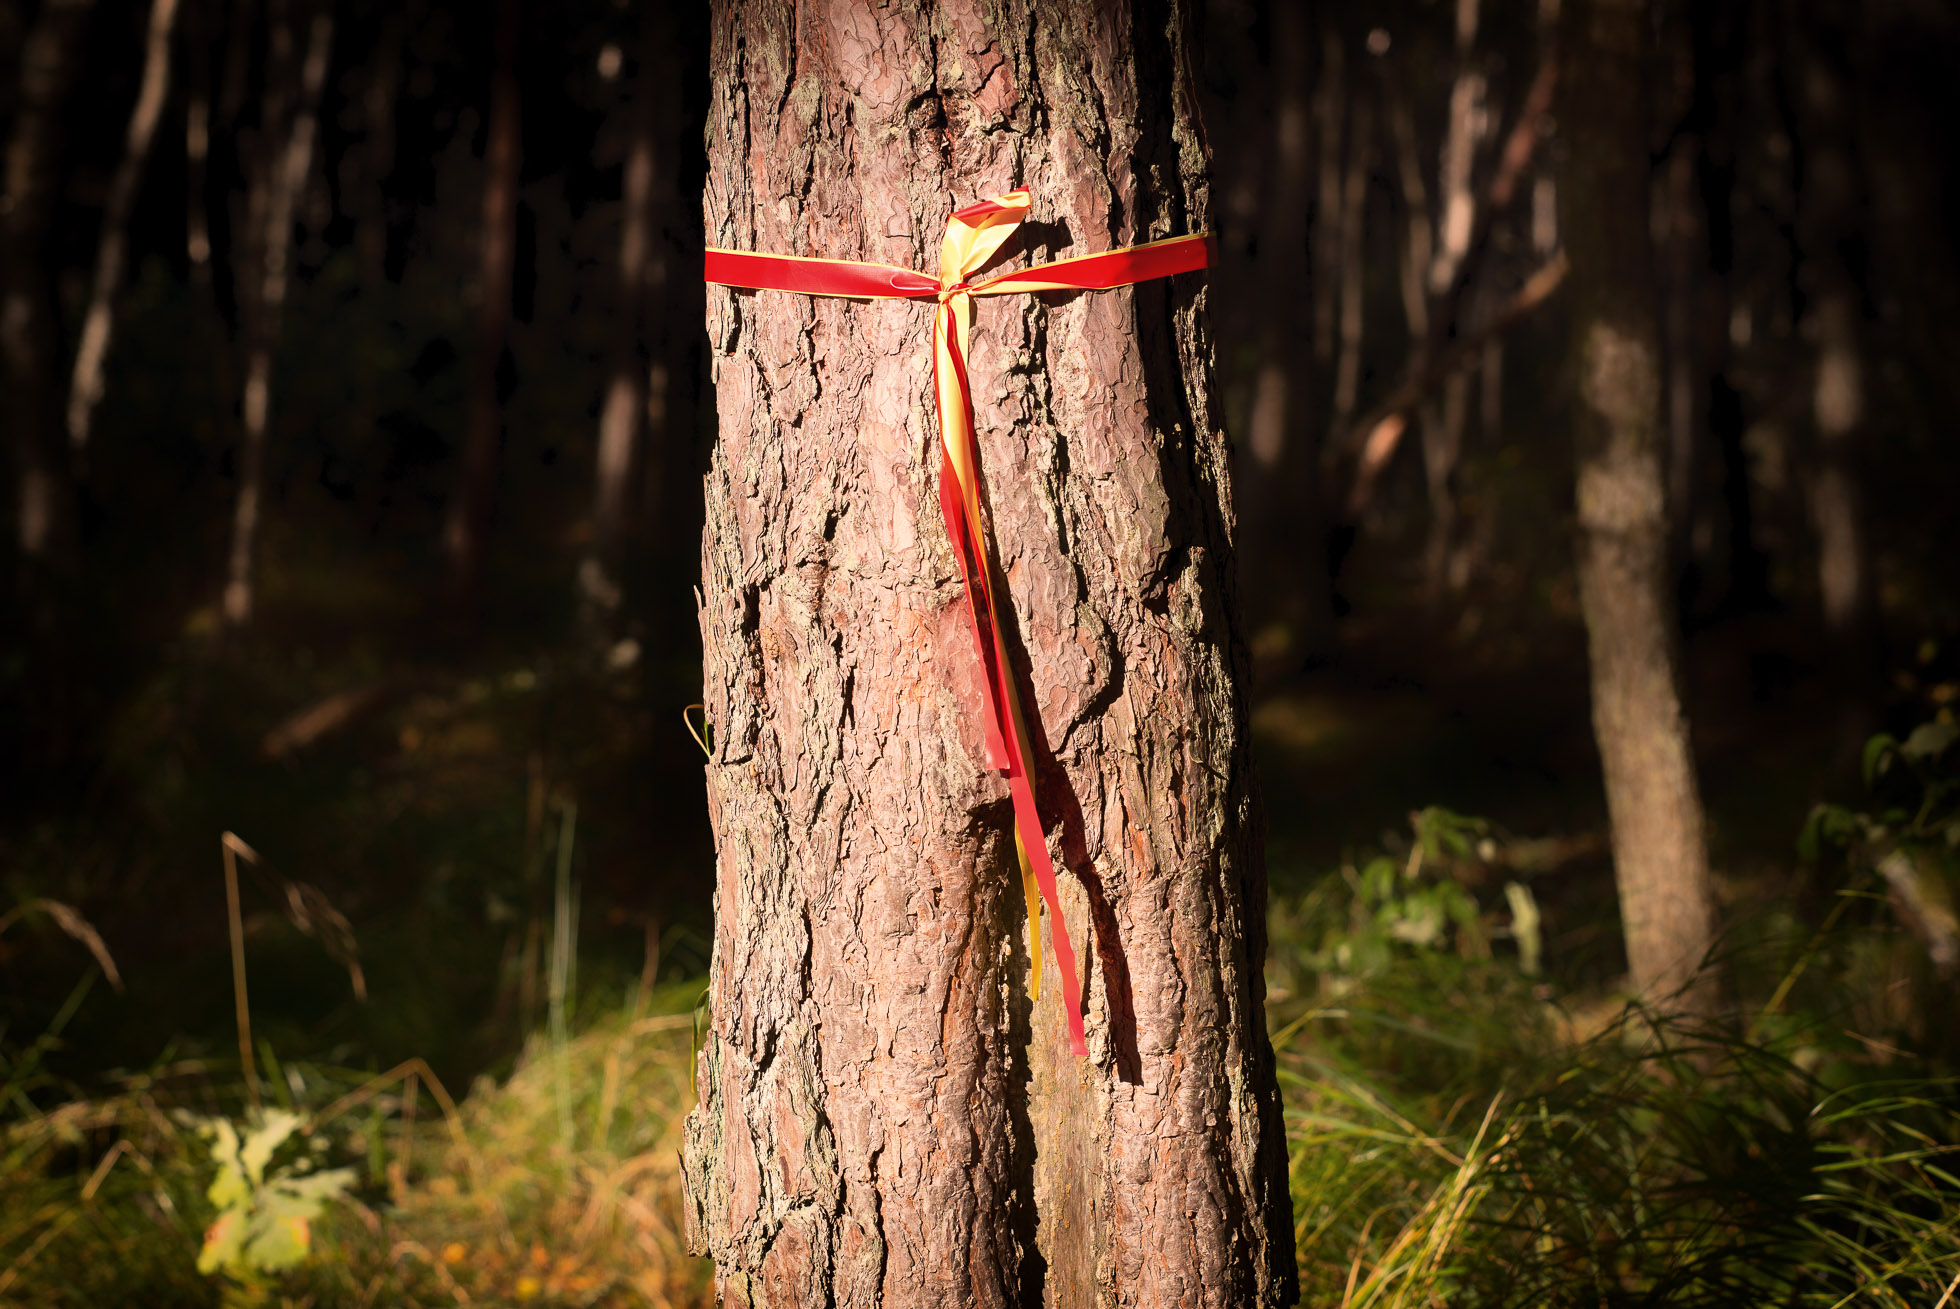 2016-10-01-skogspromenad-mortsjon__2016-10-01__0058-redigera